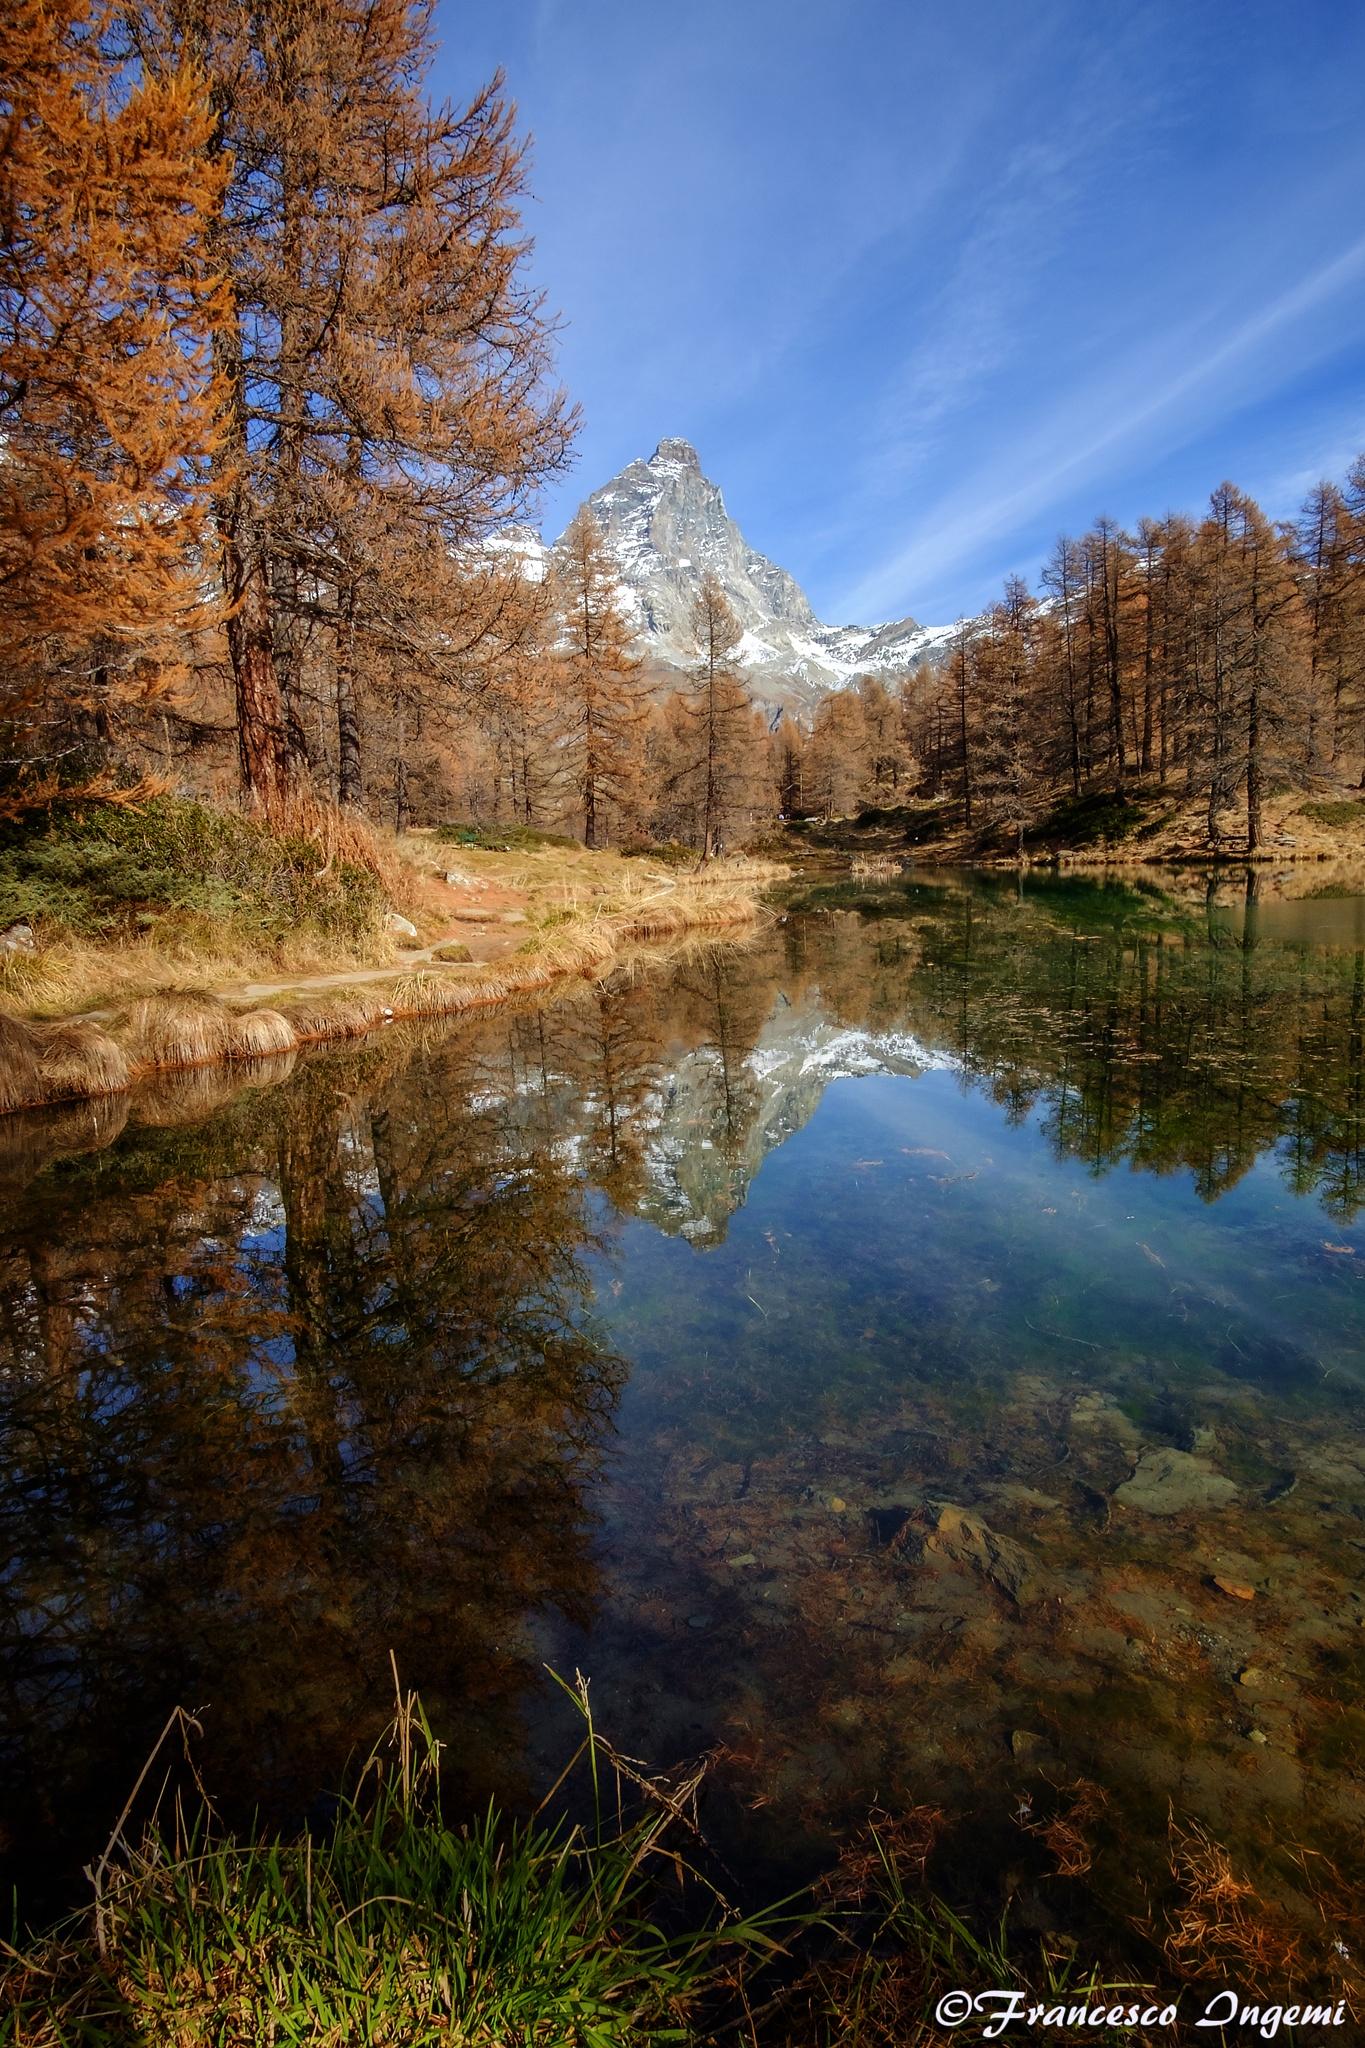 The Blue Lake. by Francesco Ingemi